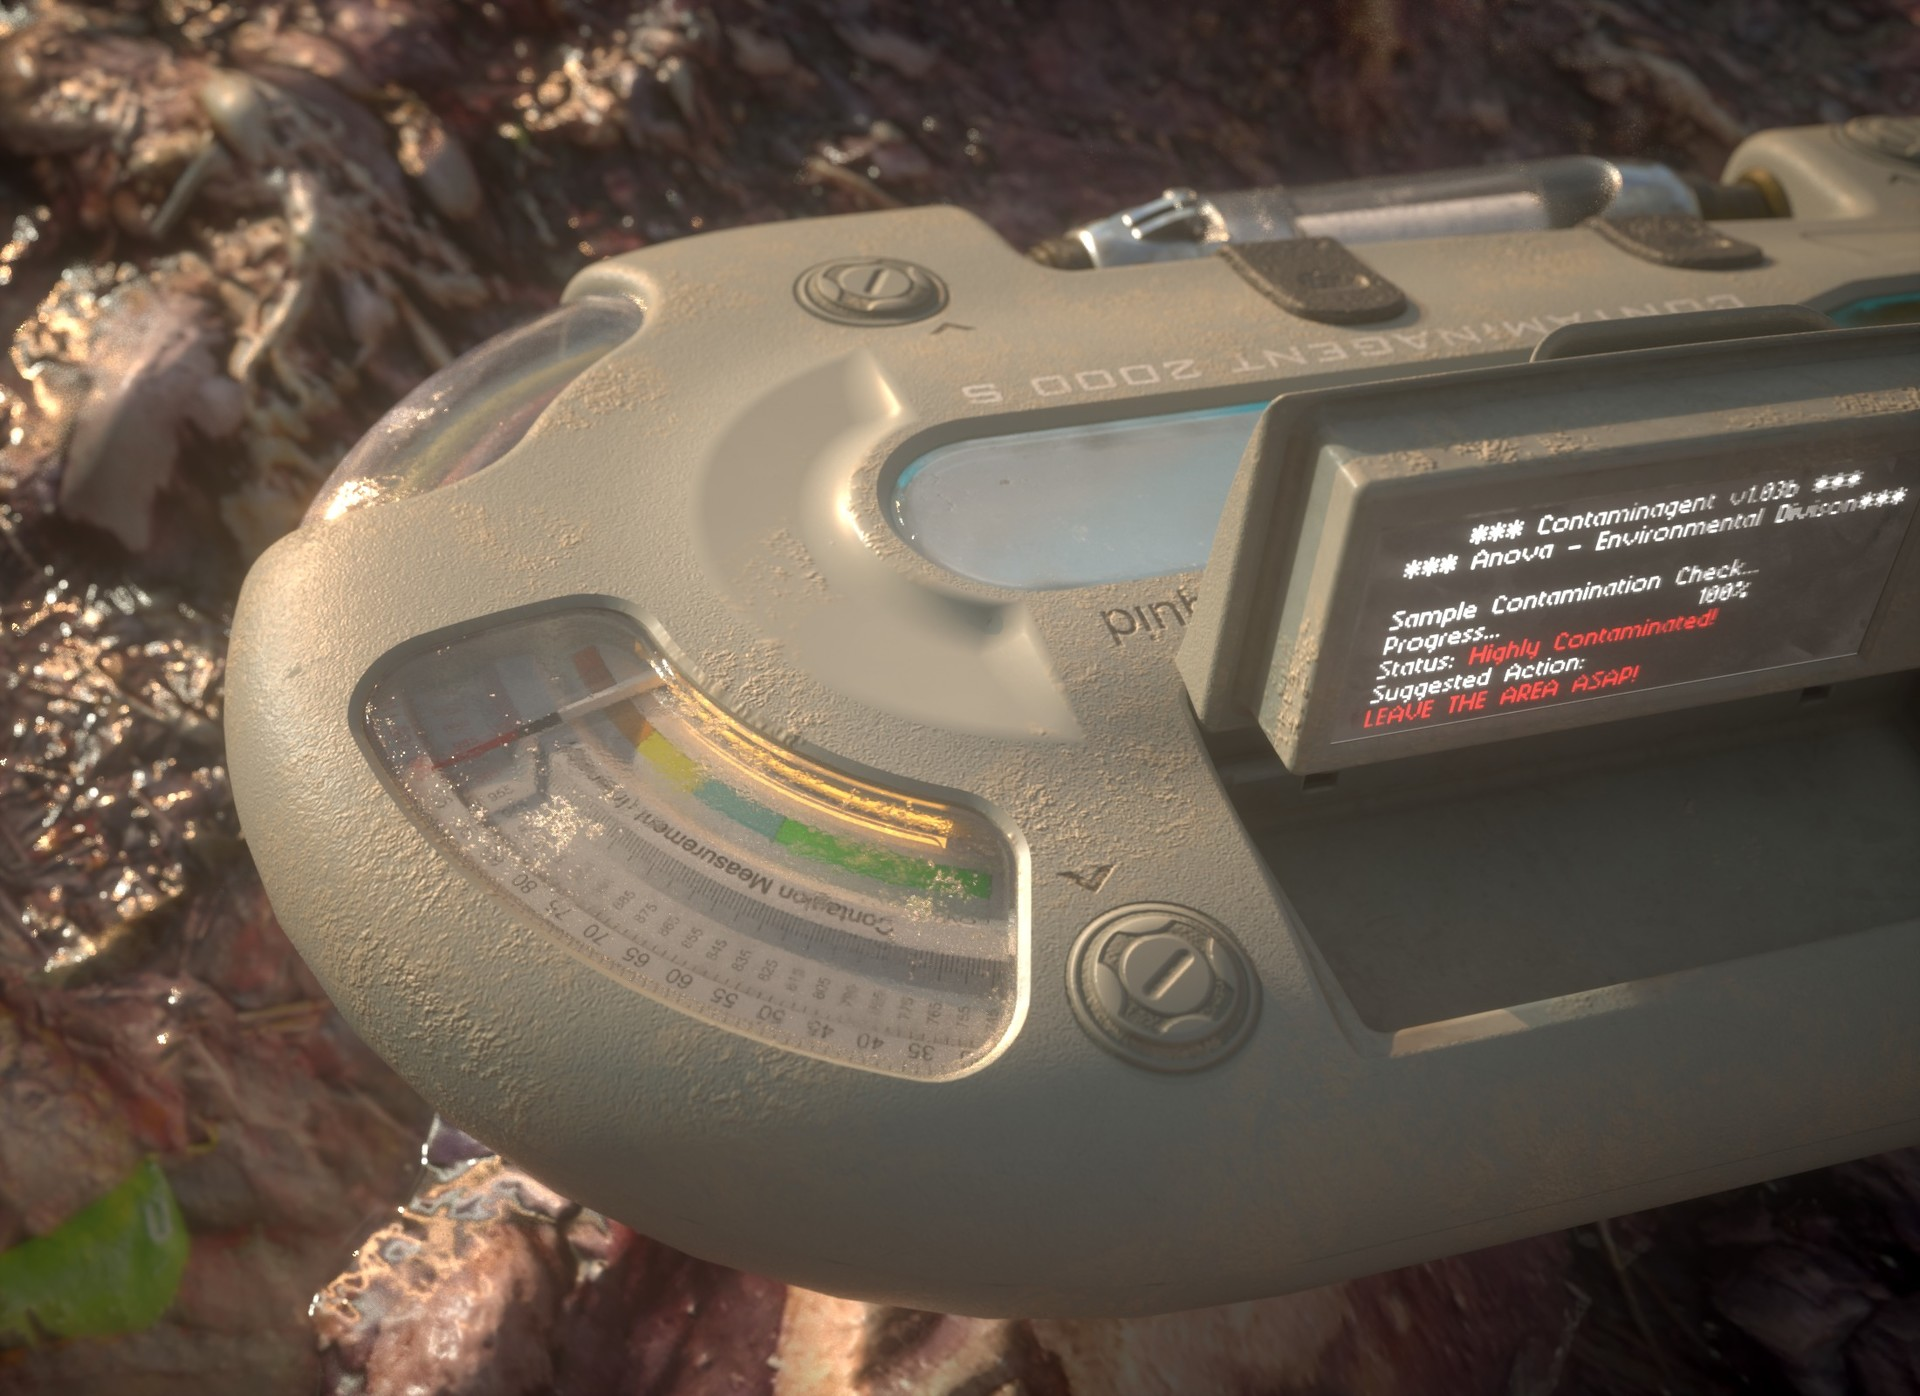 Cem tezcan device scene 00005